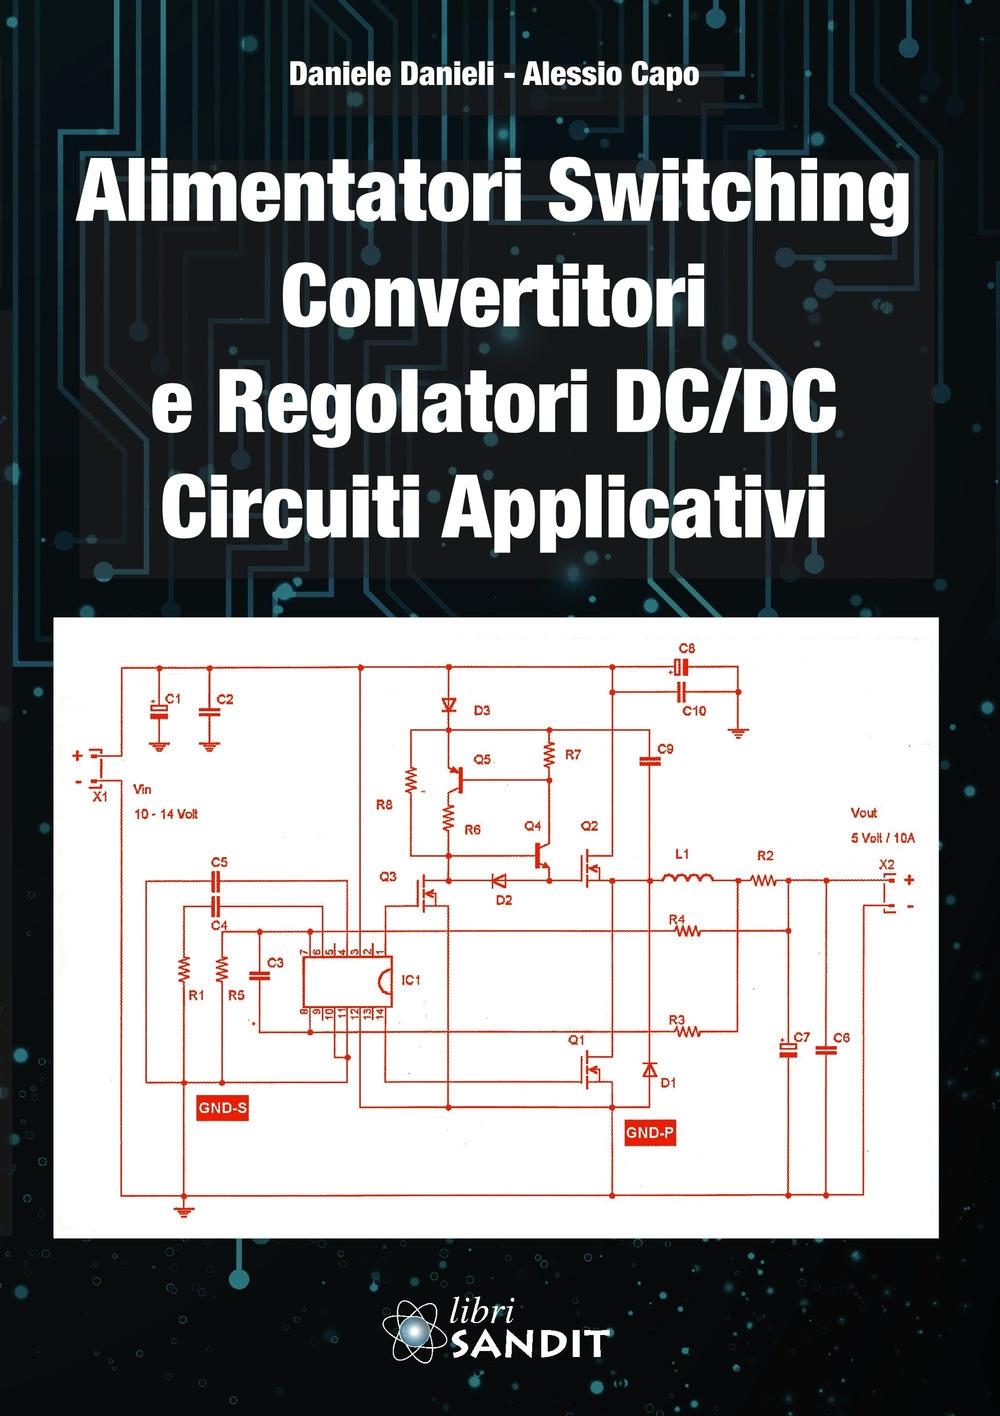 Alimentatori switching, convertitori e regolatori DC/DC. Circuiti applicativi.